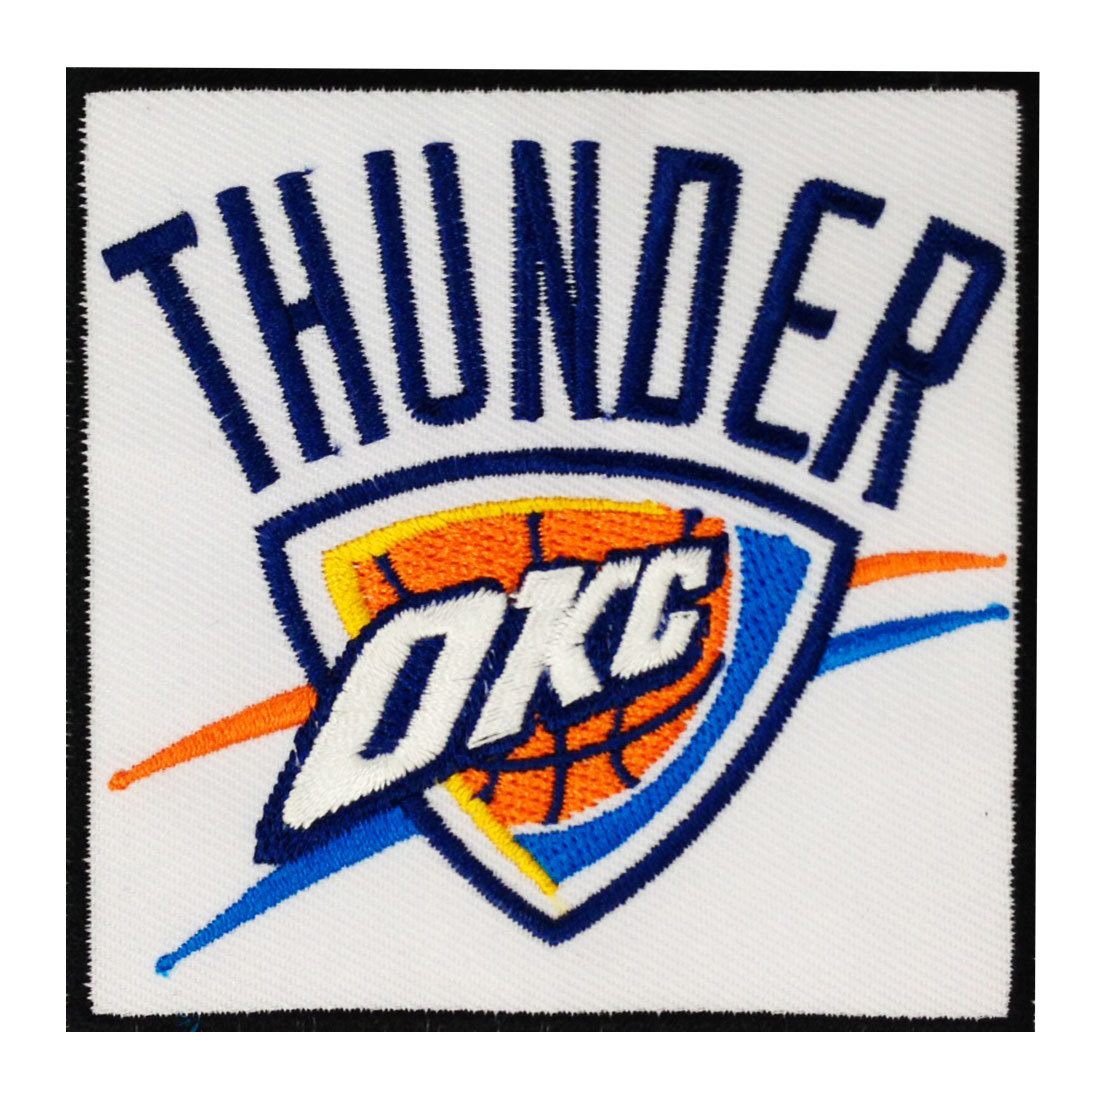 Oklahoma city thunder logo embroidered iron patches